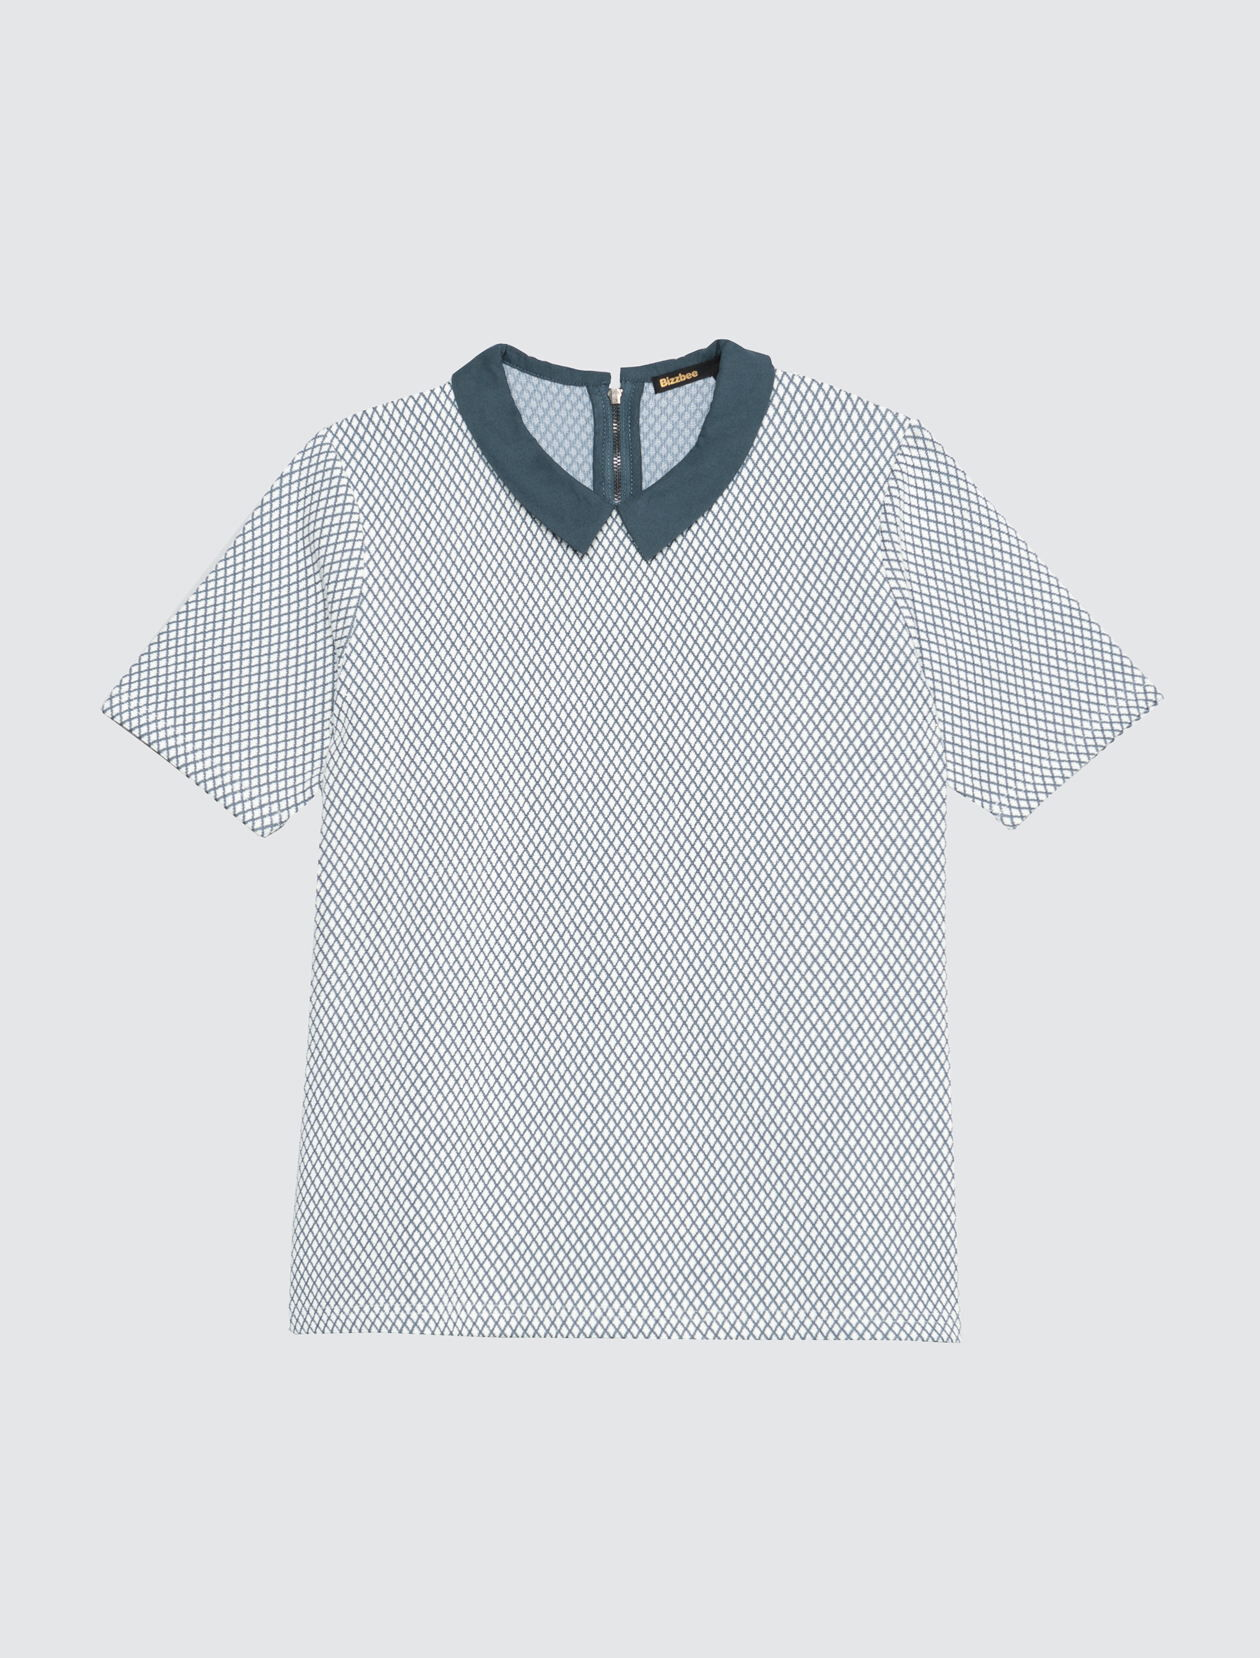 T-shirt jacquard col chemise Femme Bleu Indigo